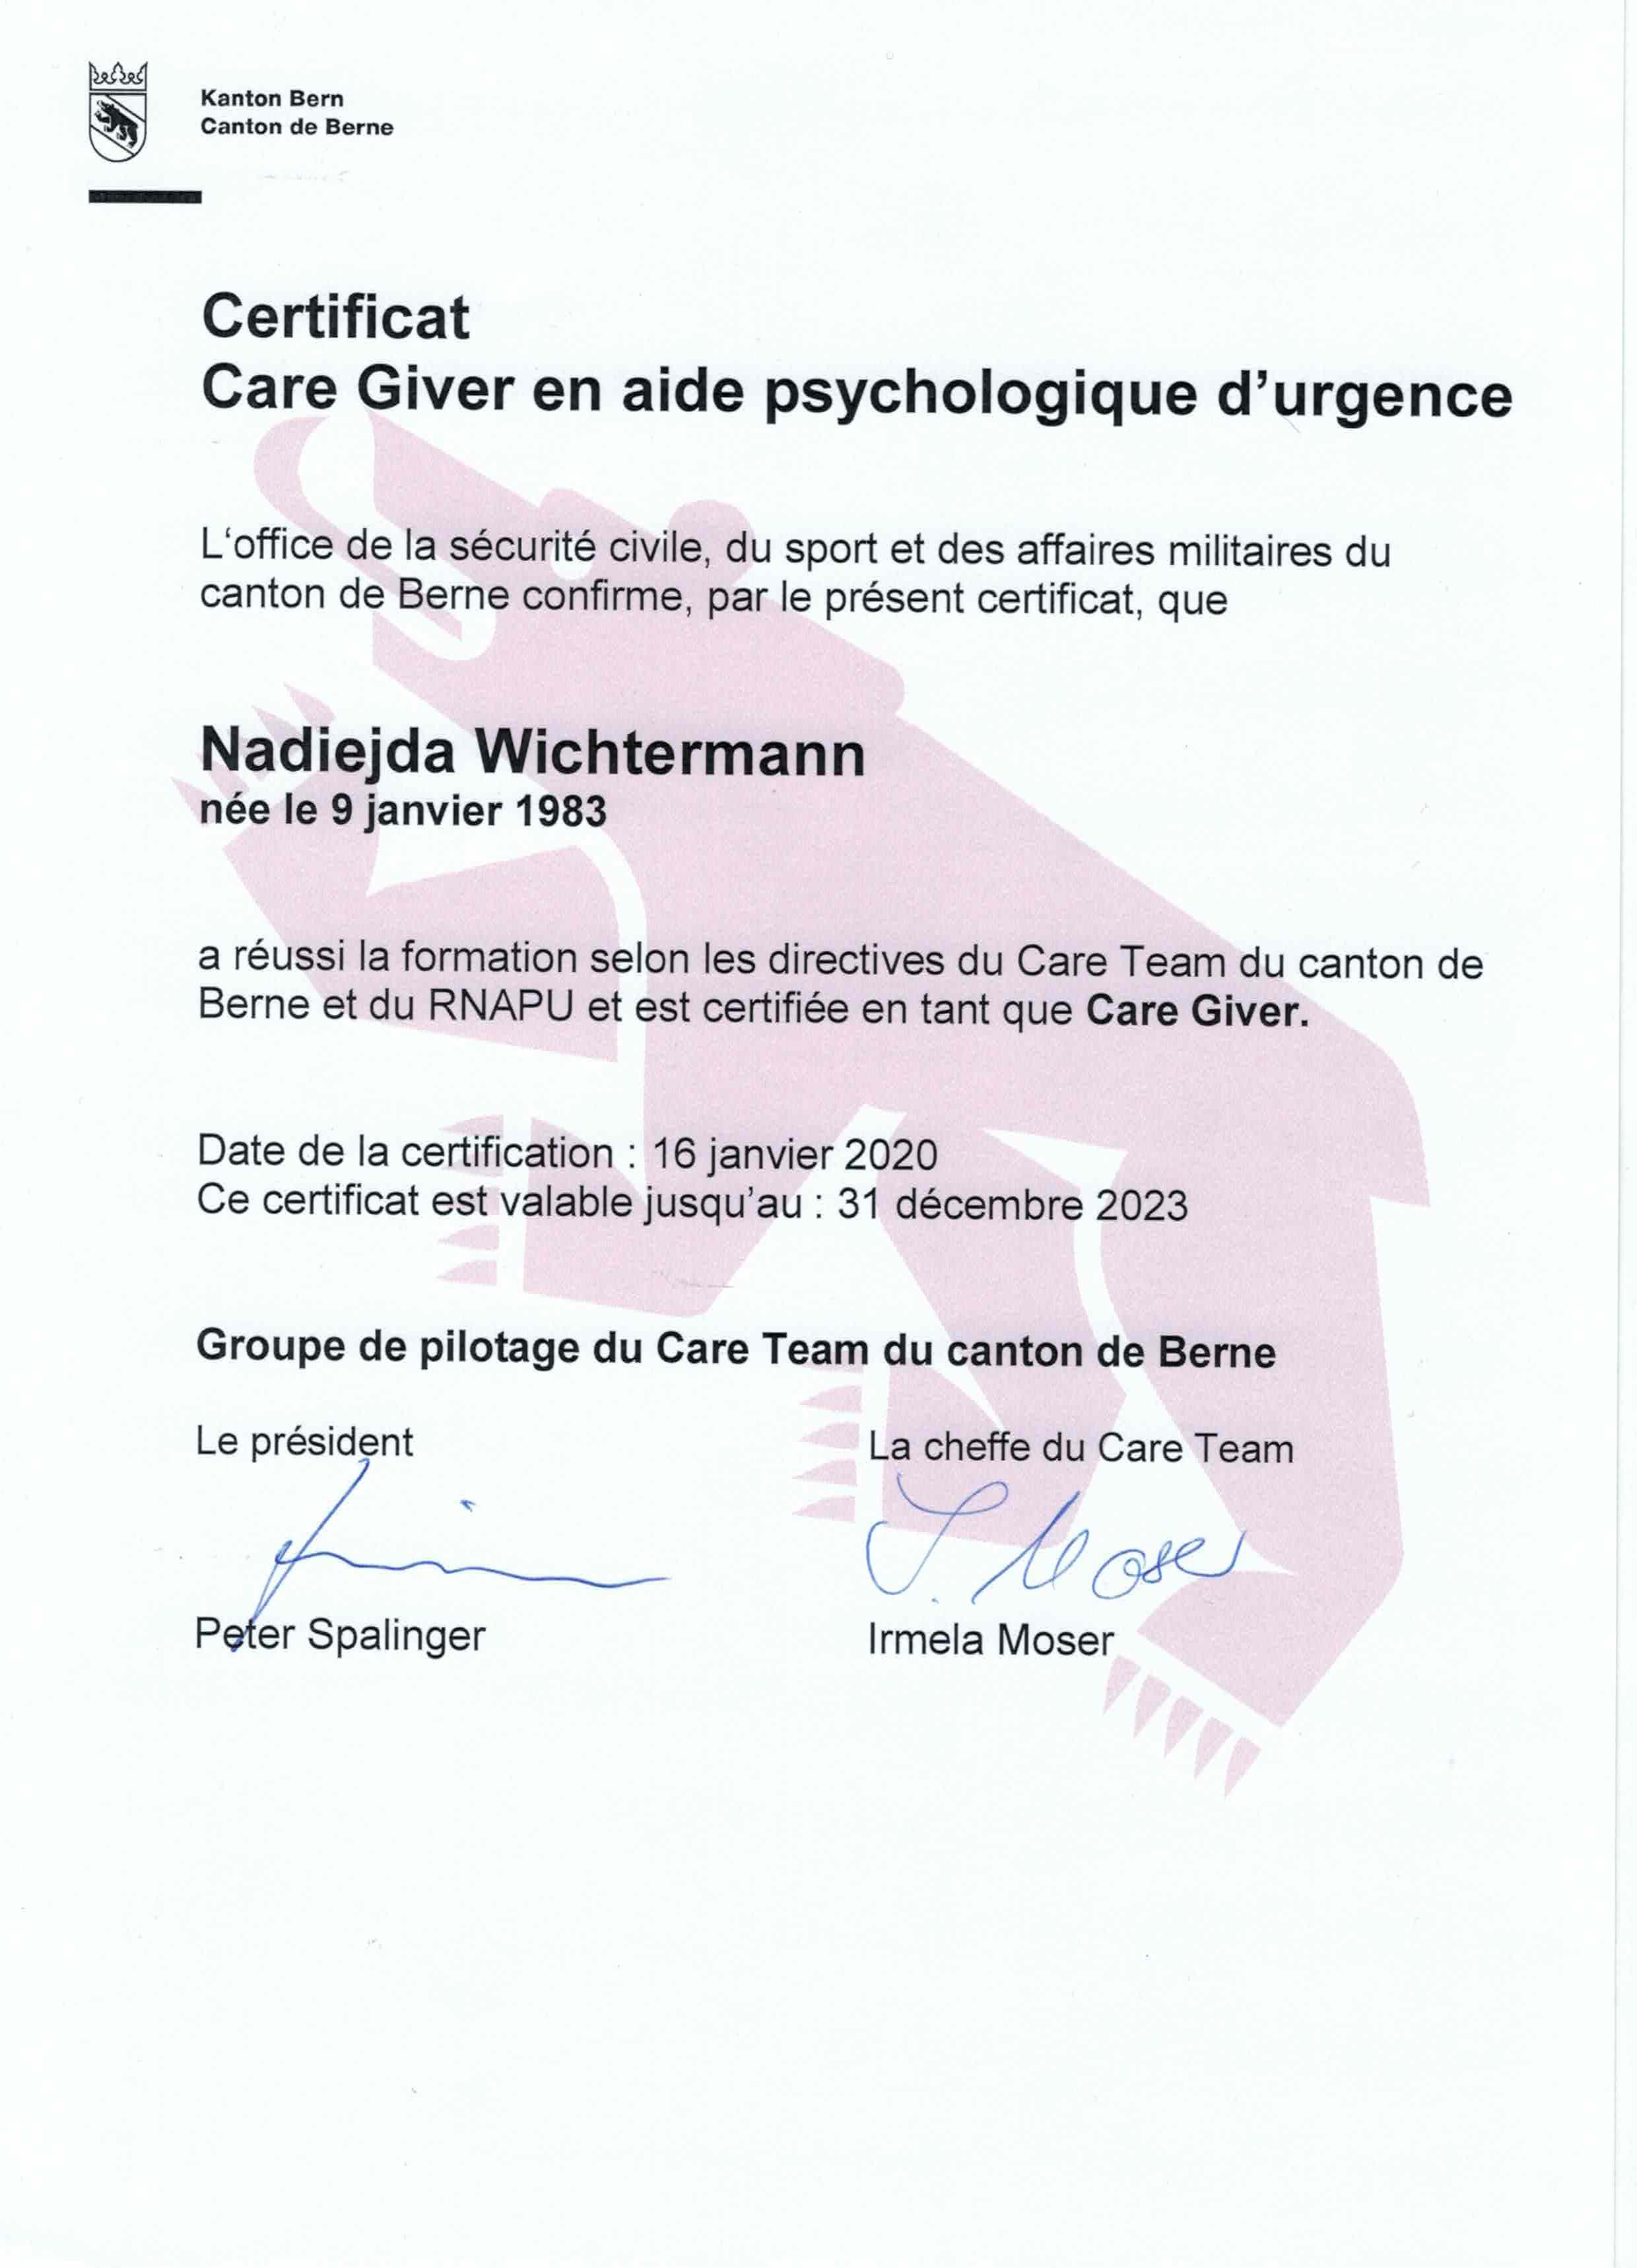 Certificat Care Giver en aide psychologique durgencejpeg